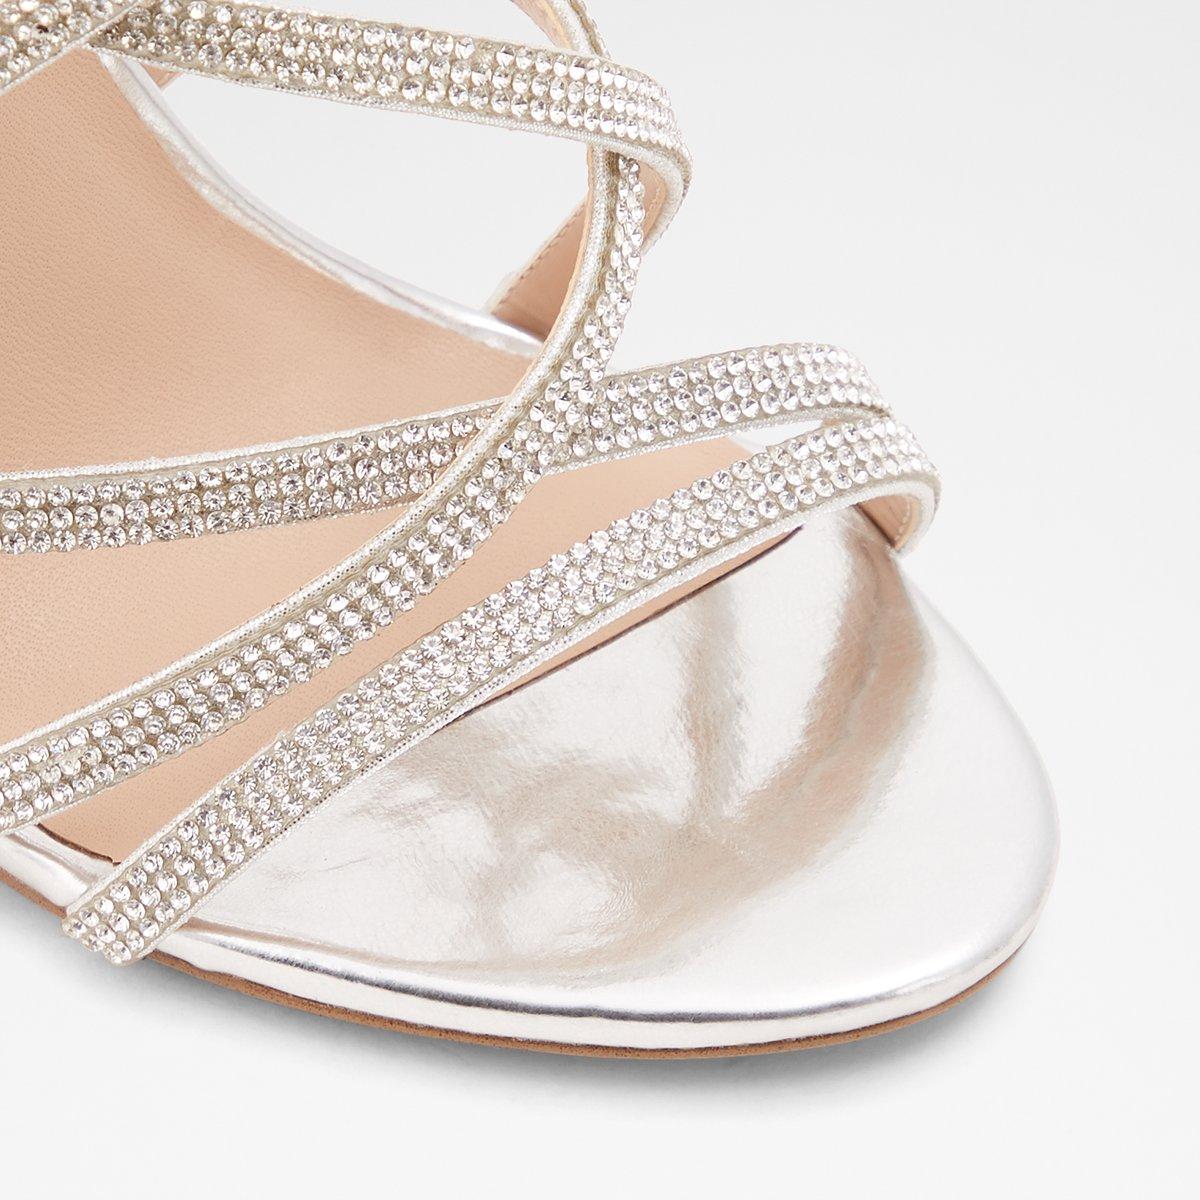 W Elegante Meraerk Silber SandalettenDeutschland Damen rBWdxoCe